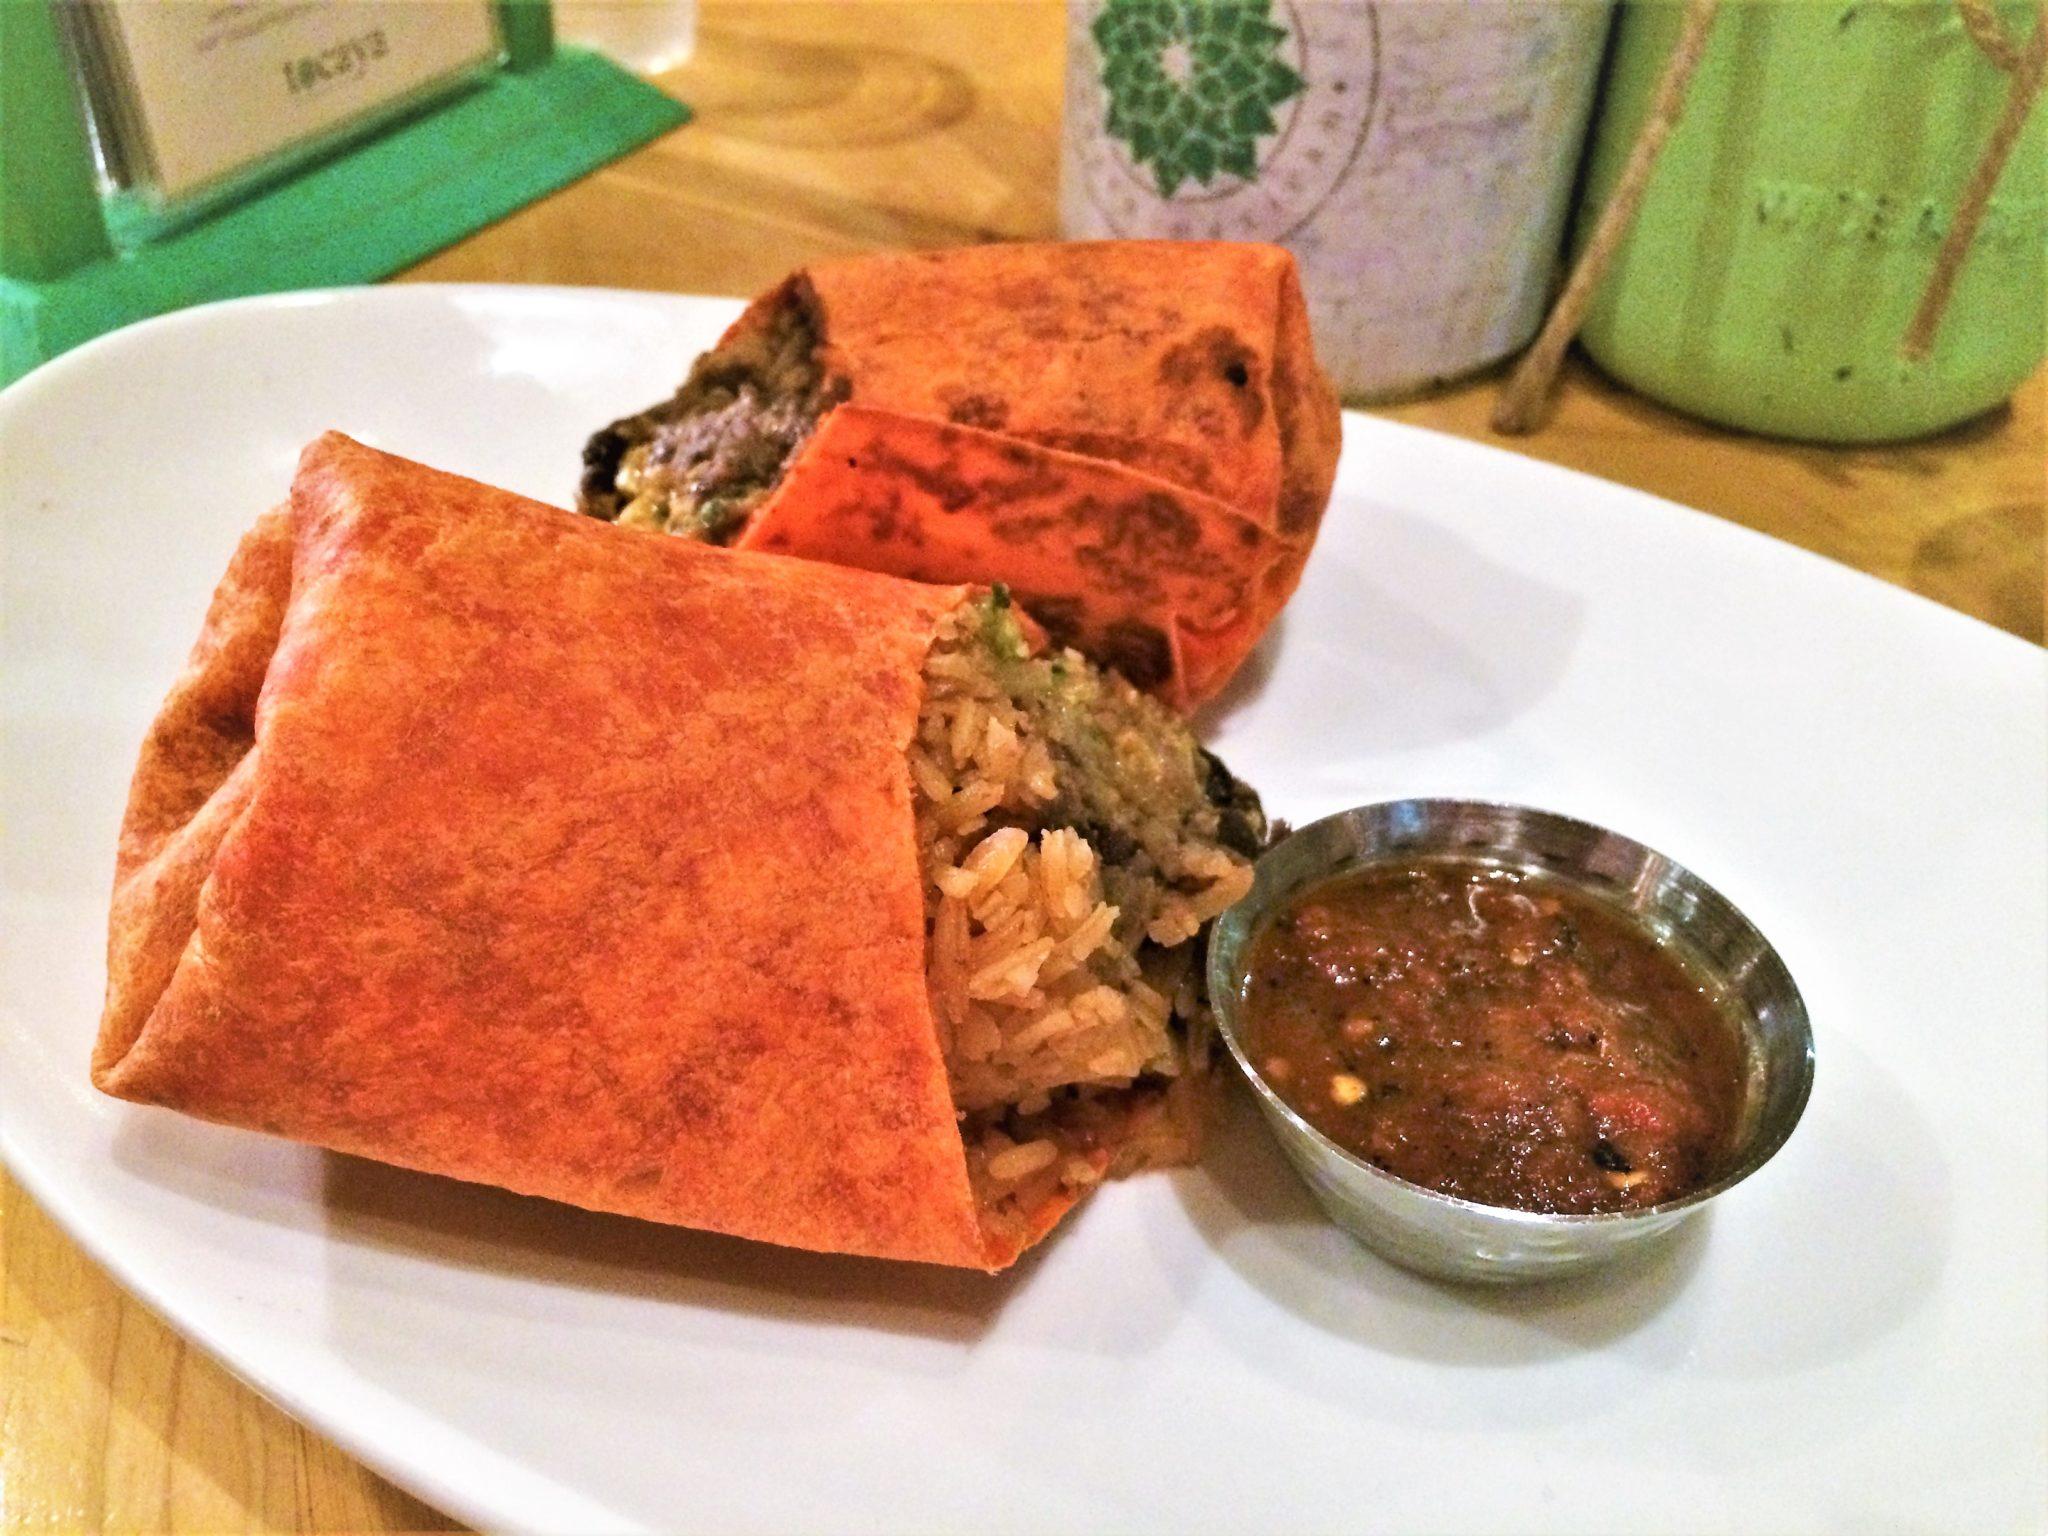 Vegan restaurants Los Angeles, Tocaya Organica, California, Mexican